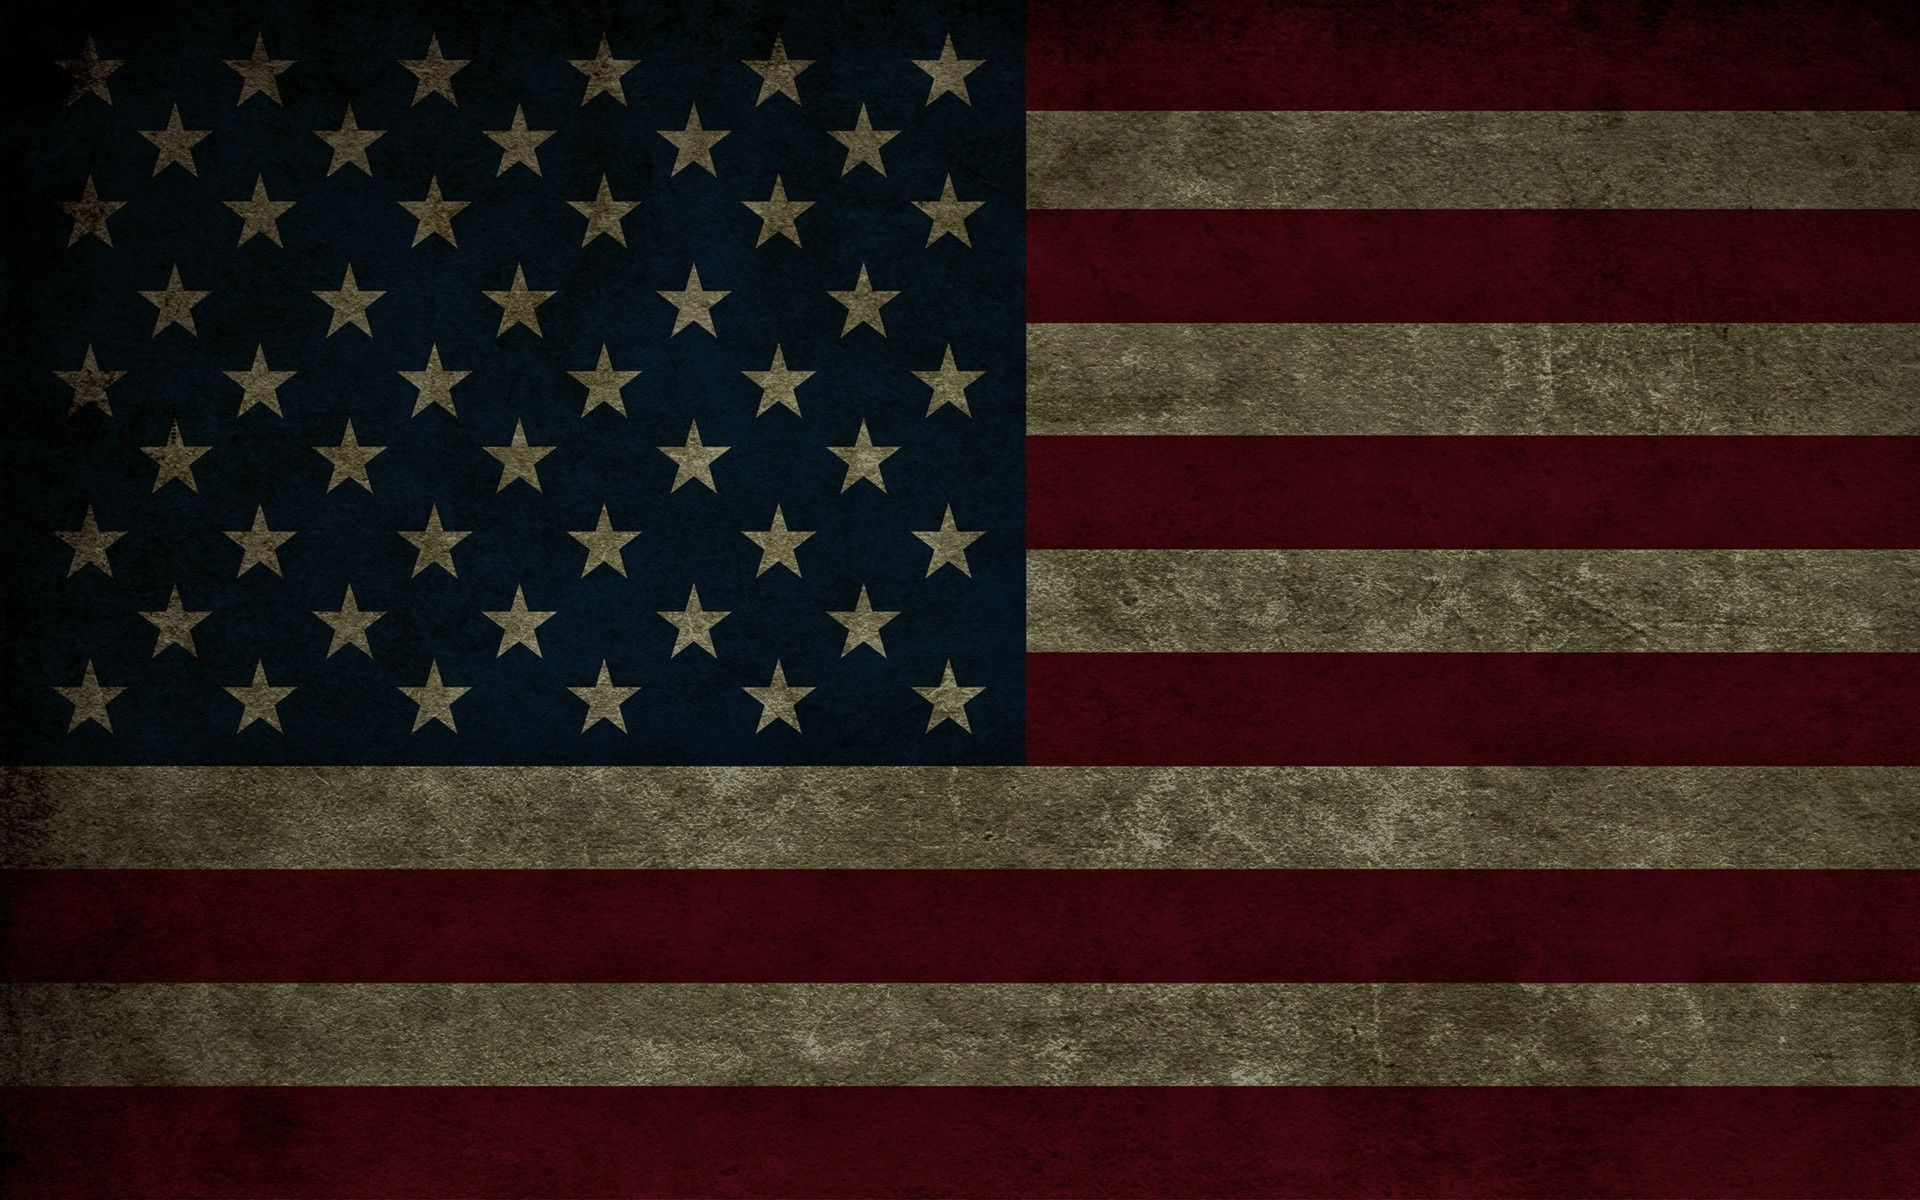 American Flag Wallpapers Wallpaper Cave Флаг, Обои для